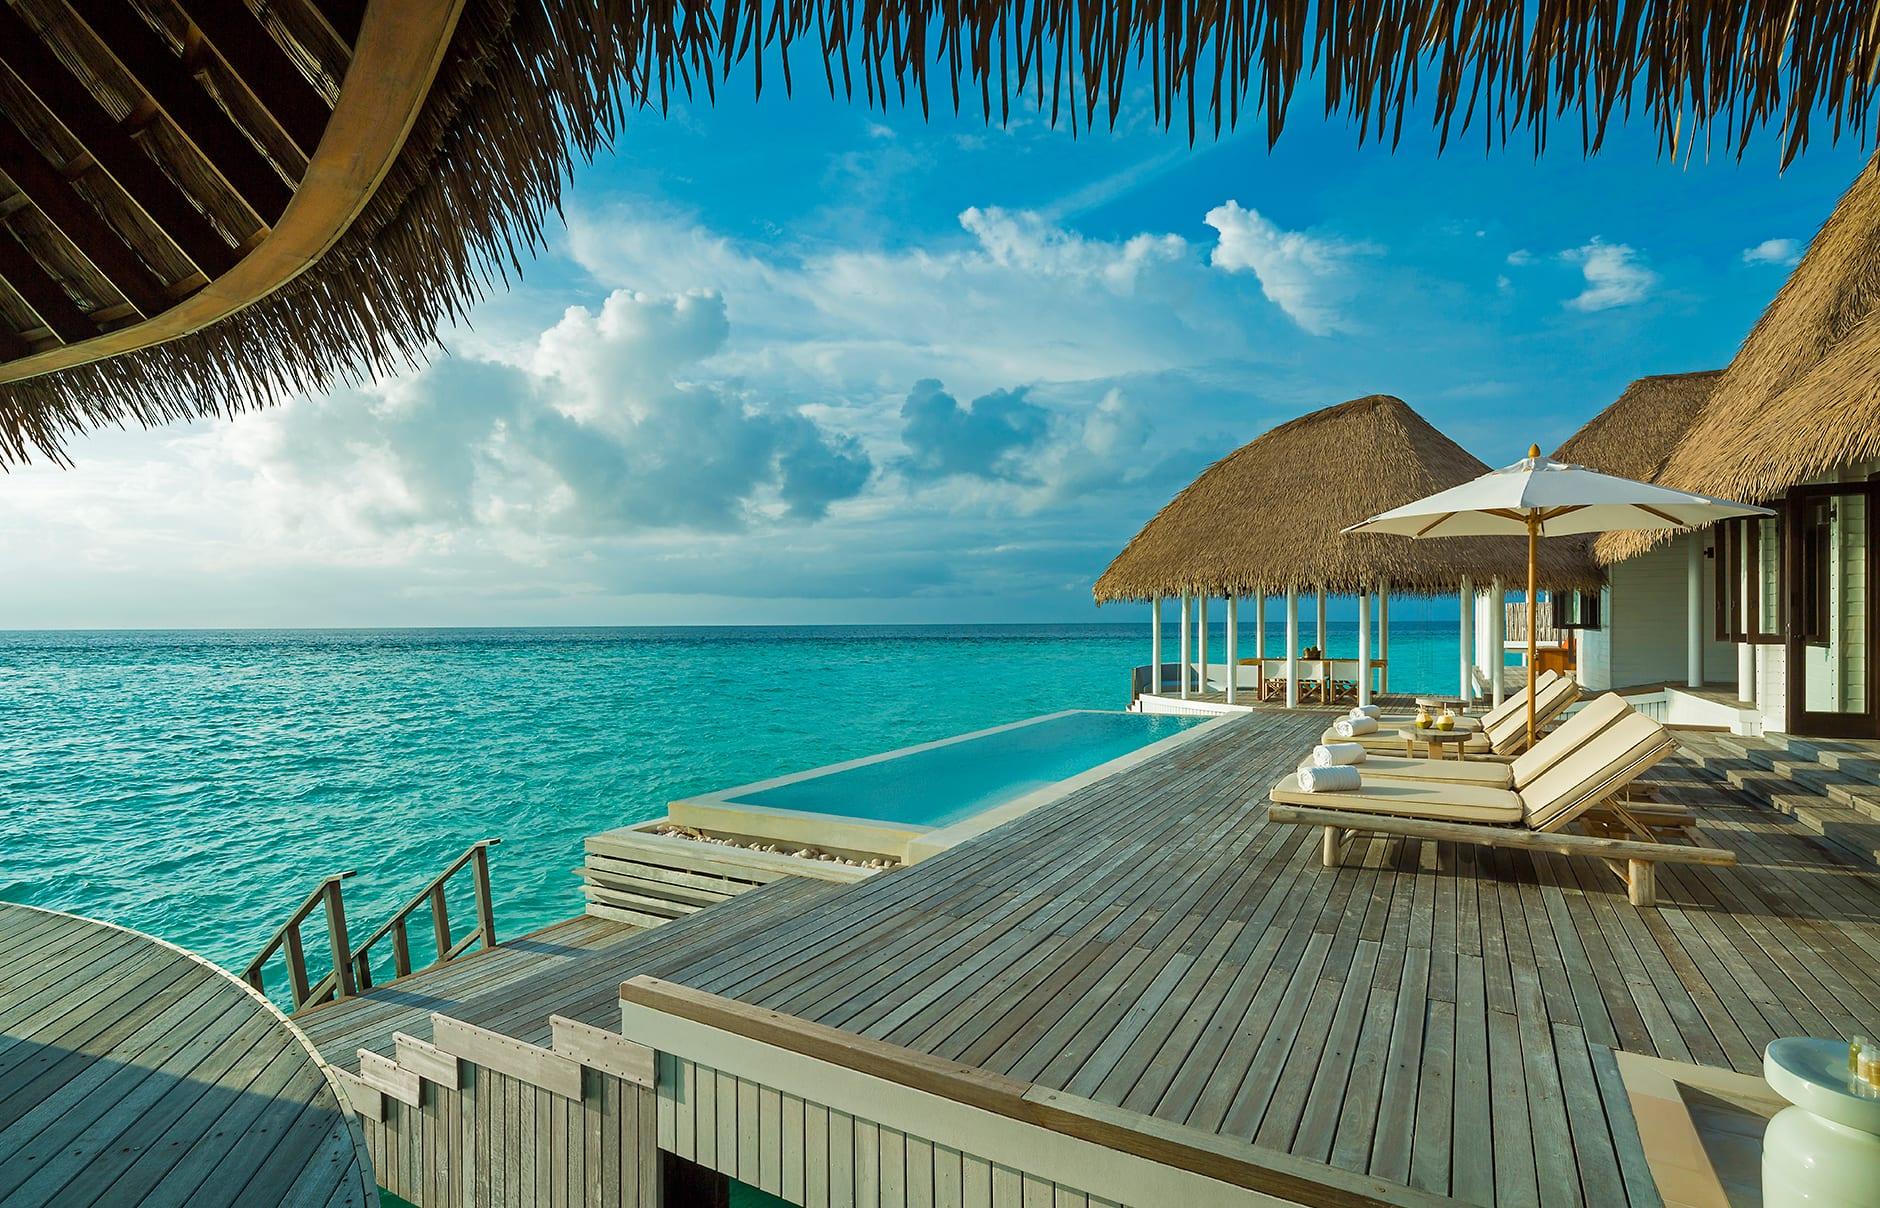 Como Villa deck. Maalifushi by COMO, Maldives. © COMO Hotels & Resorts